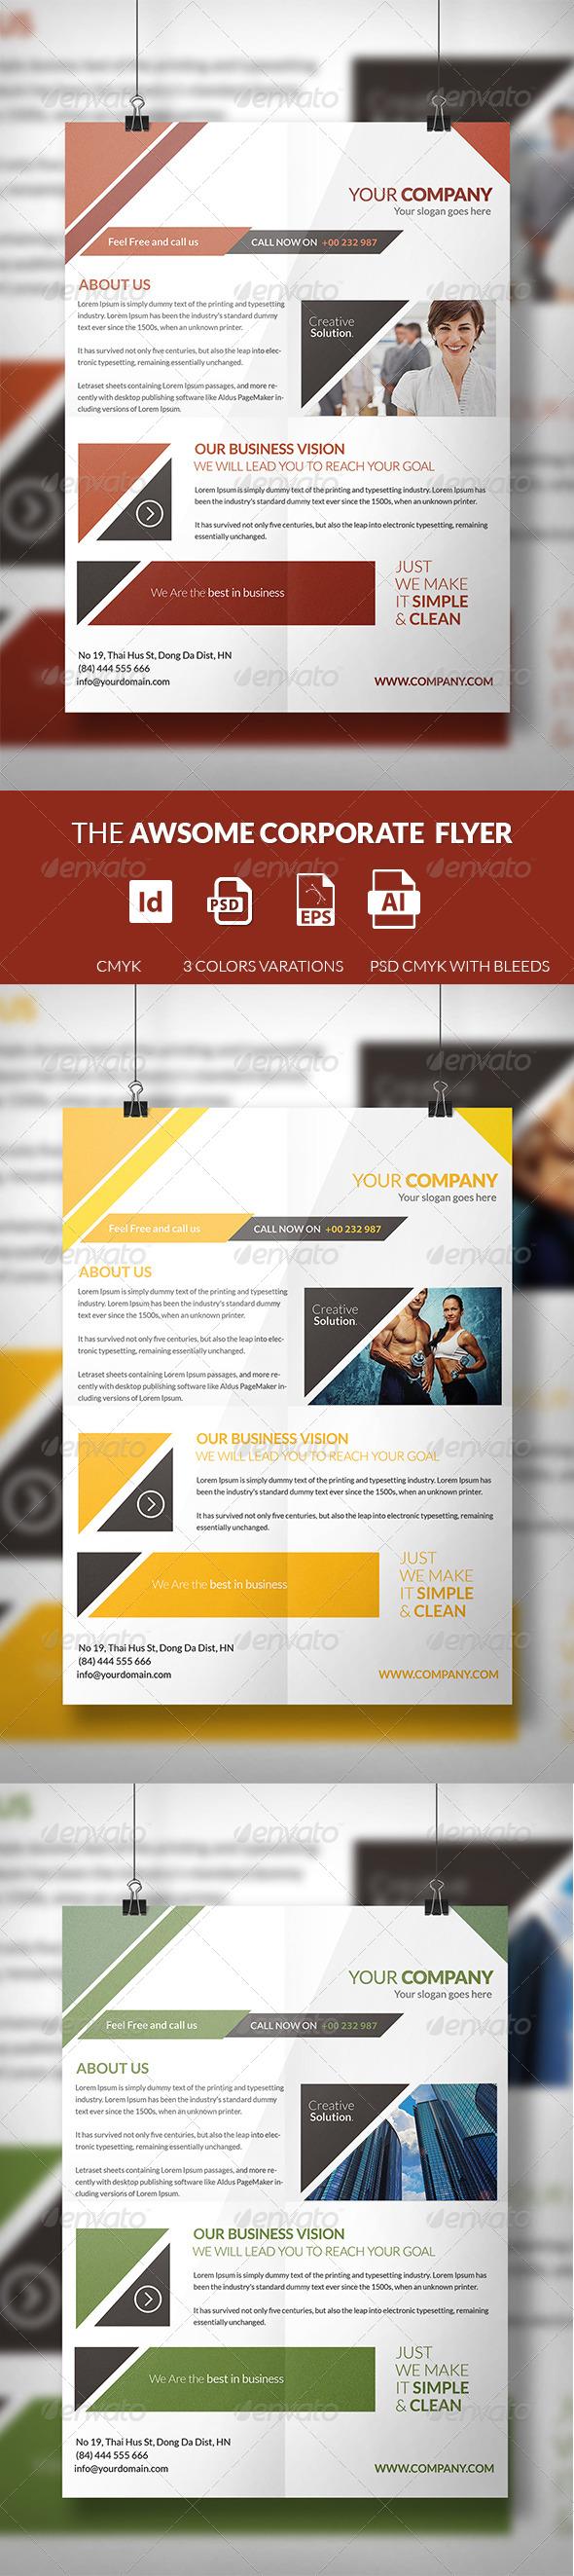 GraphicRiver The Awsome Corporate Flyer Template 7433186